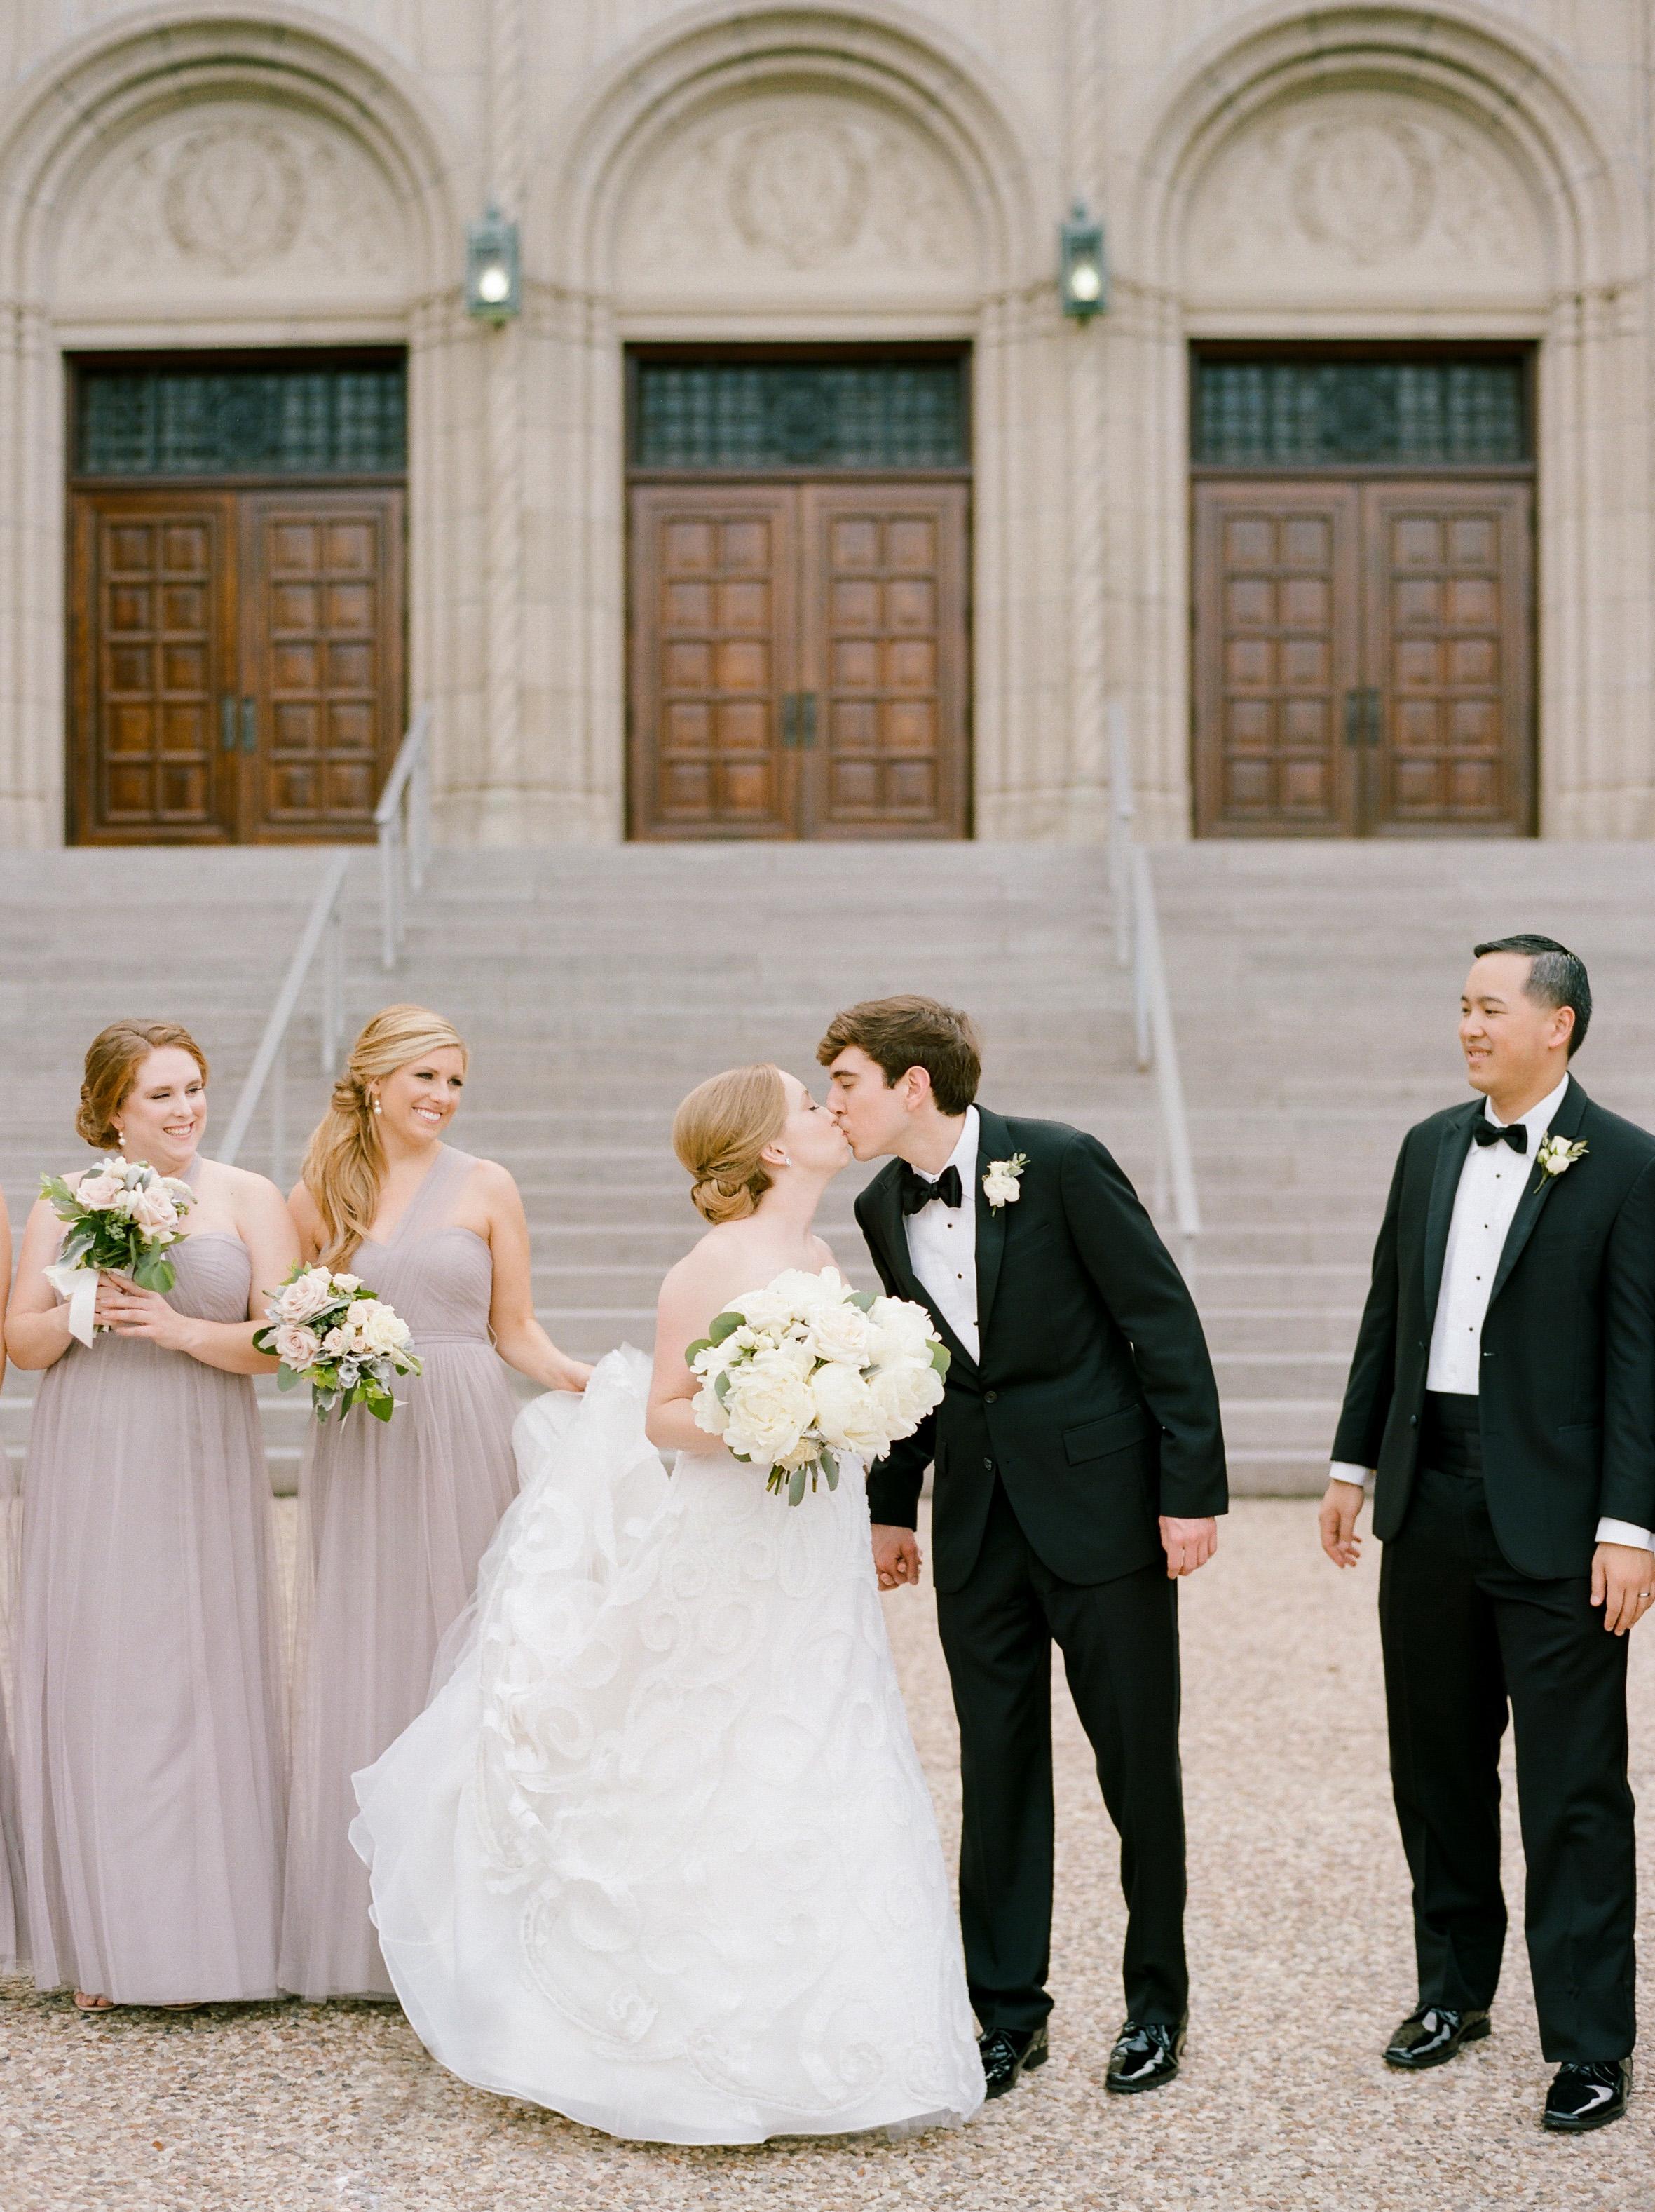 Fine-Art-Film-Houston-Wedding-Photographer-Best-Top-Luxury-Texas-Austin-Dallas-Destination-Dana-Fernandez-Photography-River-Oaks-Country-Club-South-Main-Baptist-Ceremony-Reception-Wedding-1.jpg